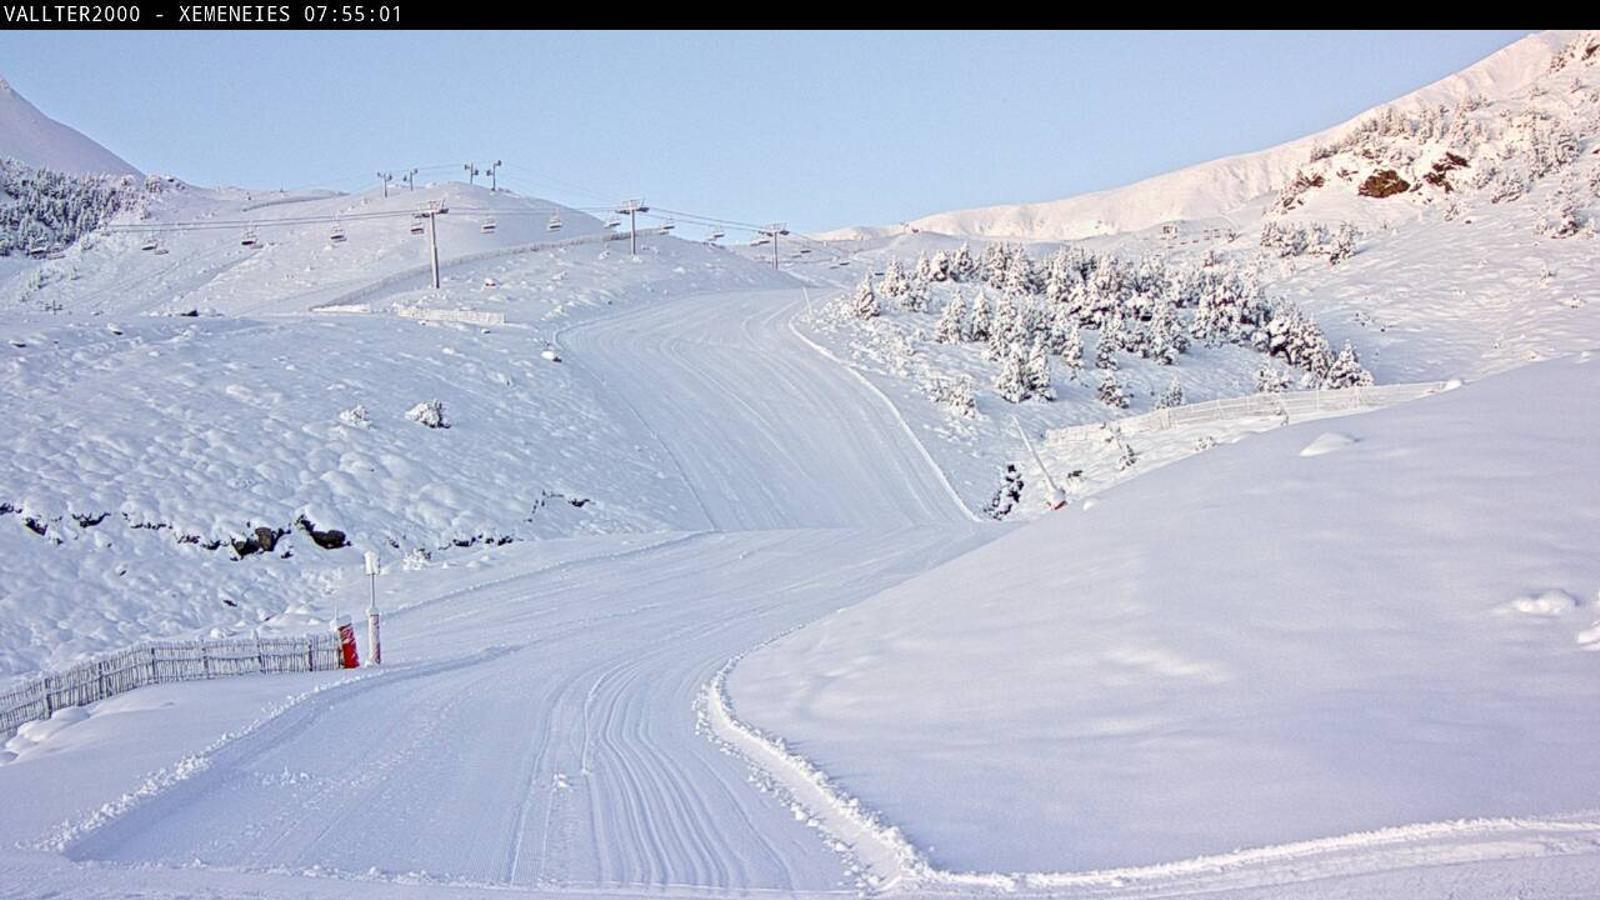 Nevada de fins a 45 cm de neu recent a Vallter